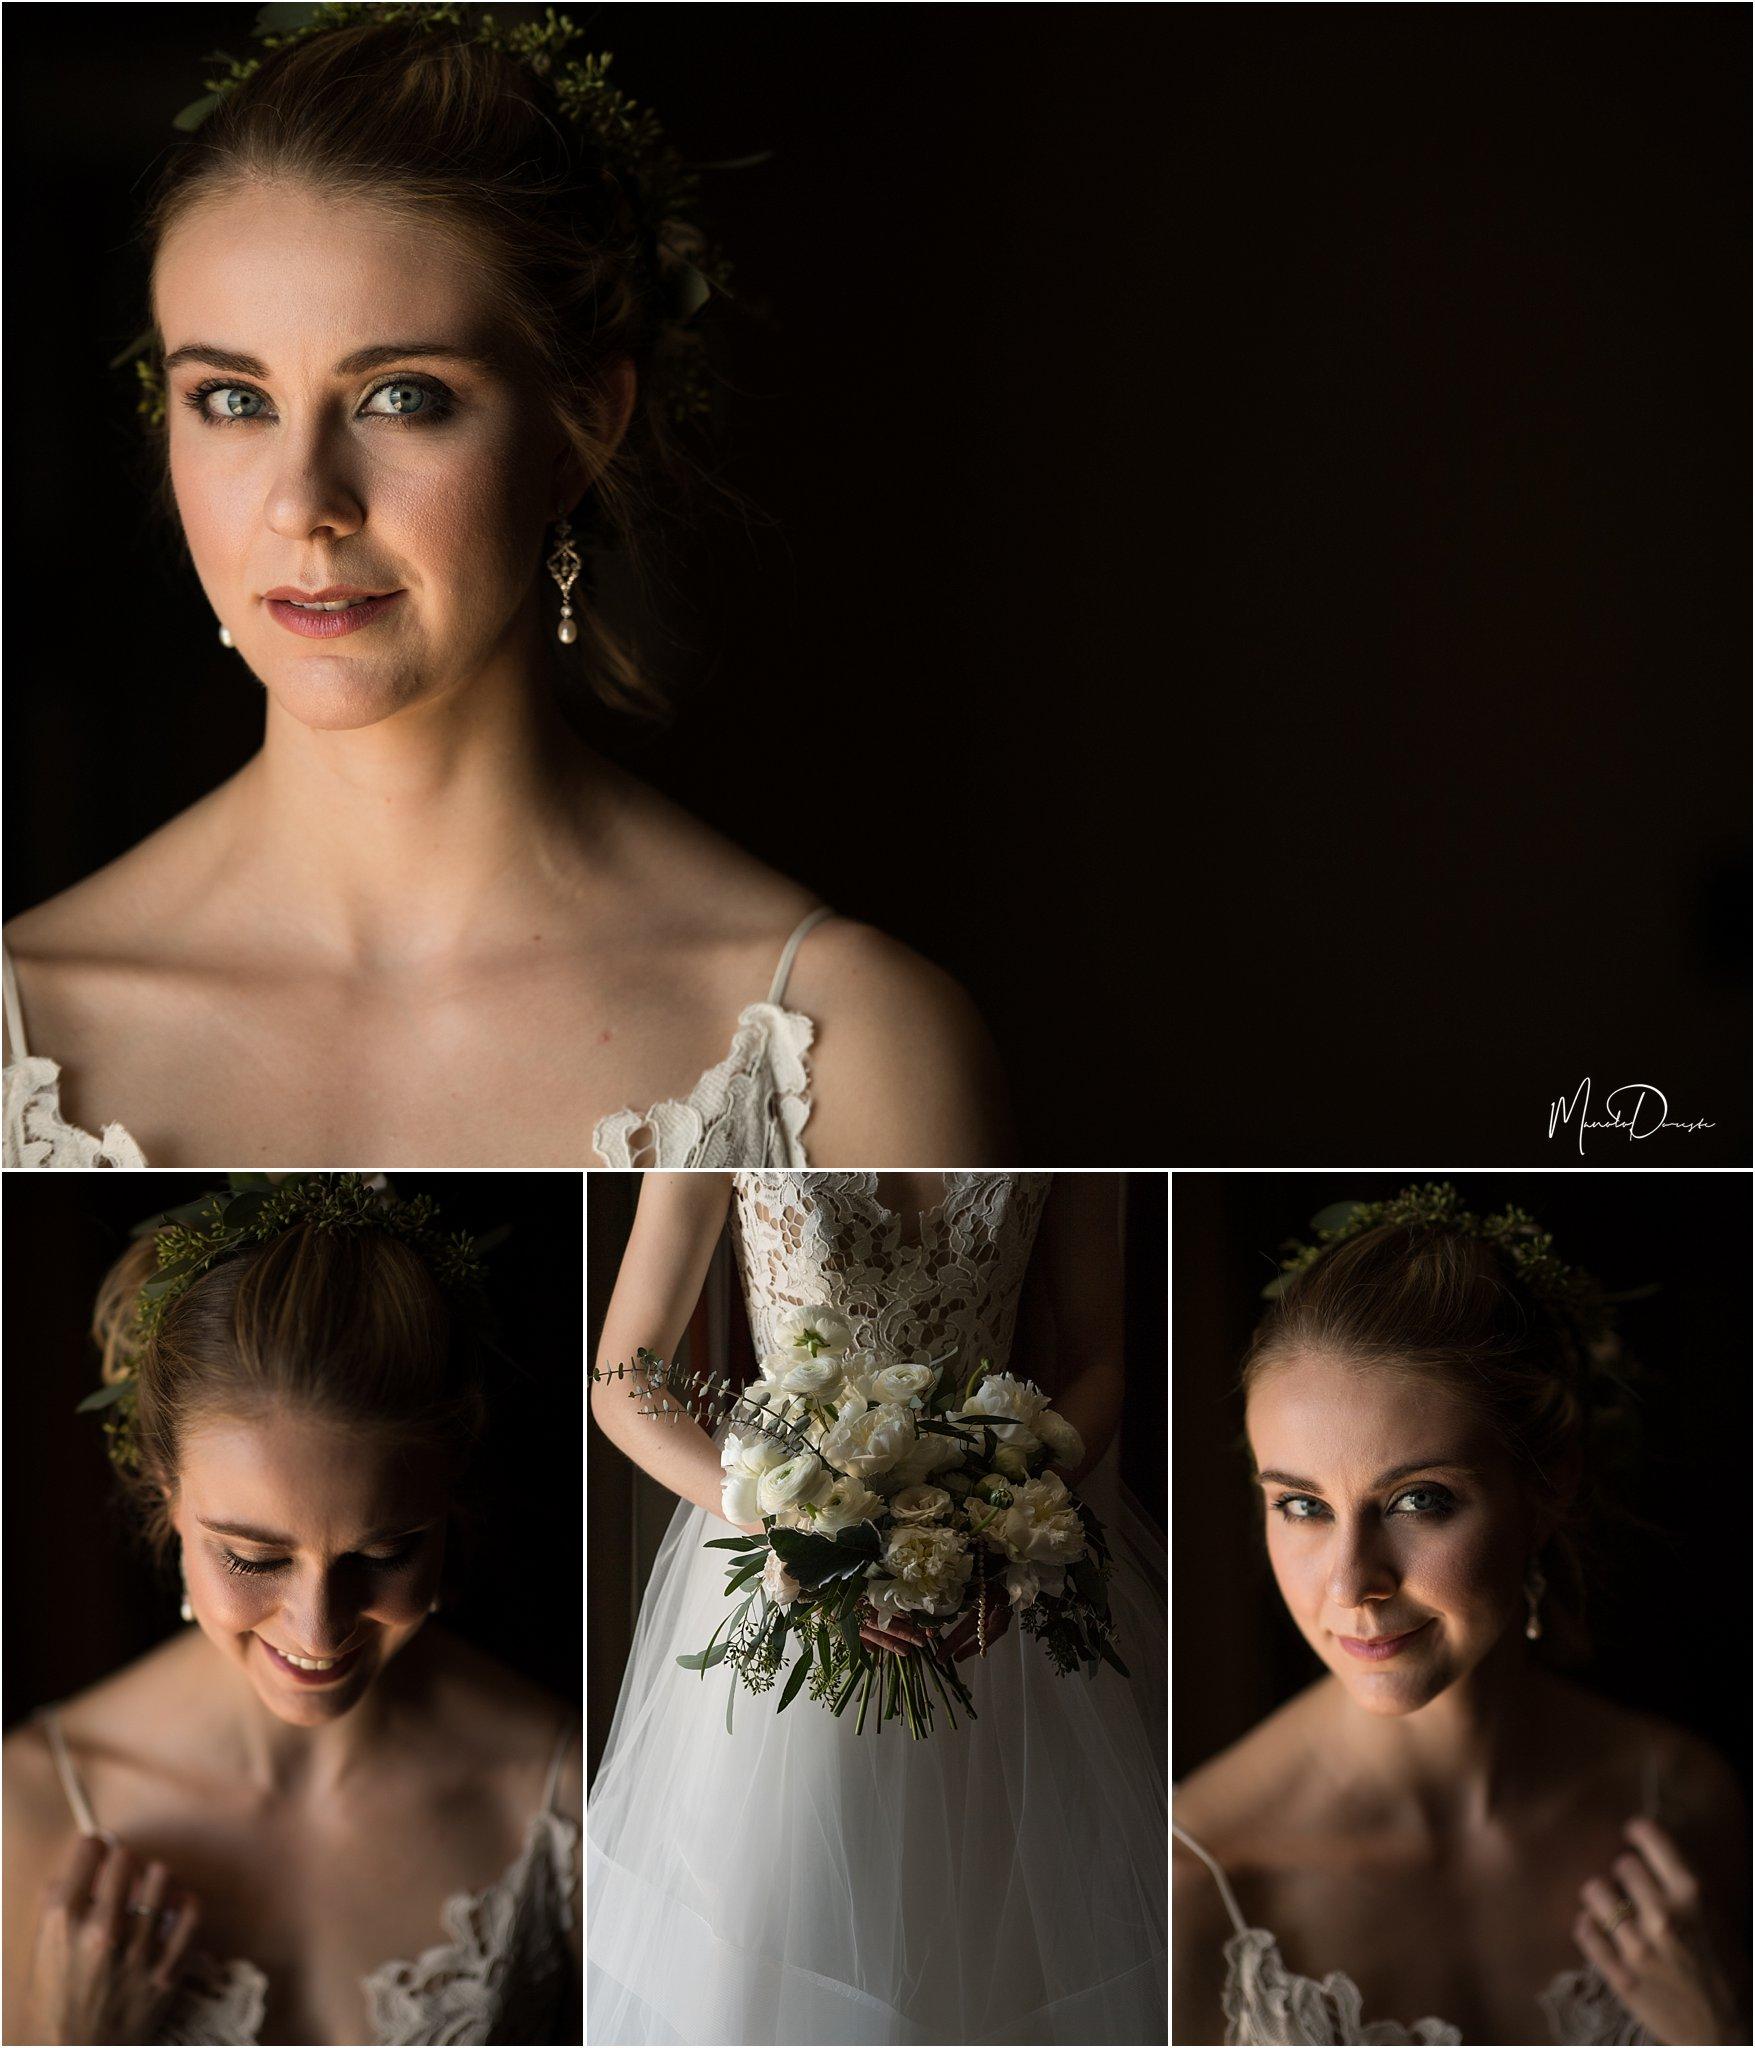 00875_ManoloDoreste_InFocusStudios_Wedding_Family_Photography_Miami_MiamiPhotographer.jpg